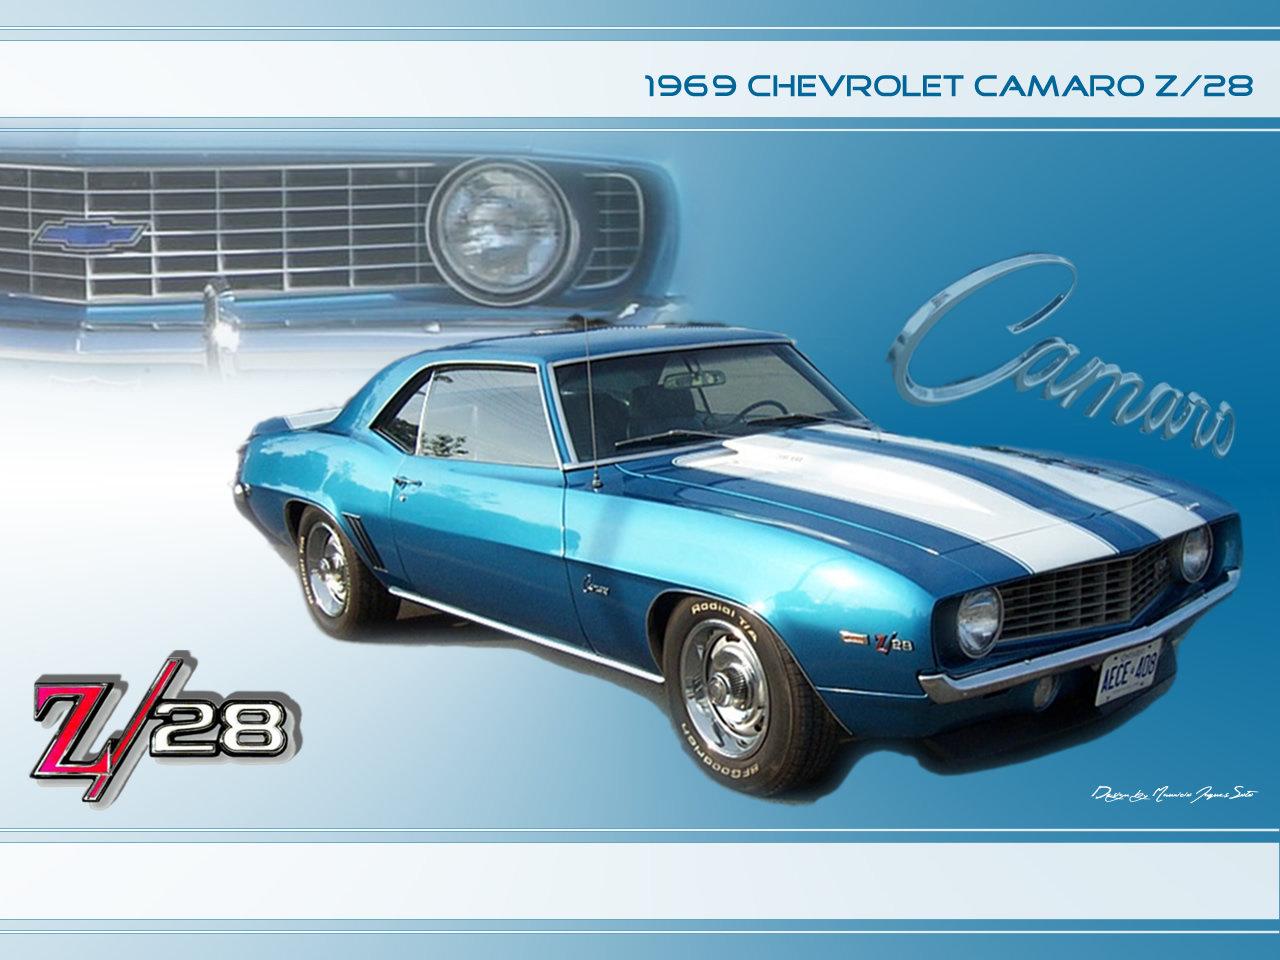 1969 Chevrolet Camaro Z28 by orishaz 1280x960